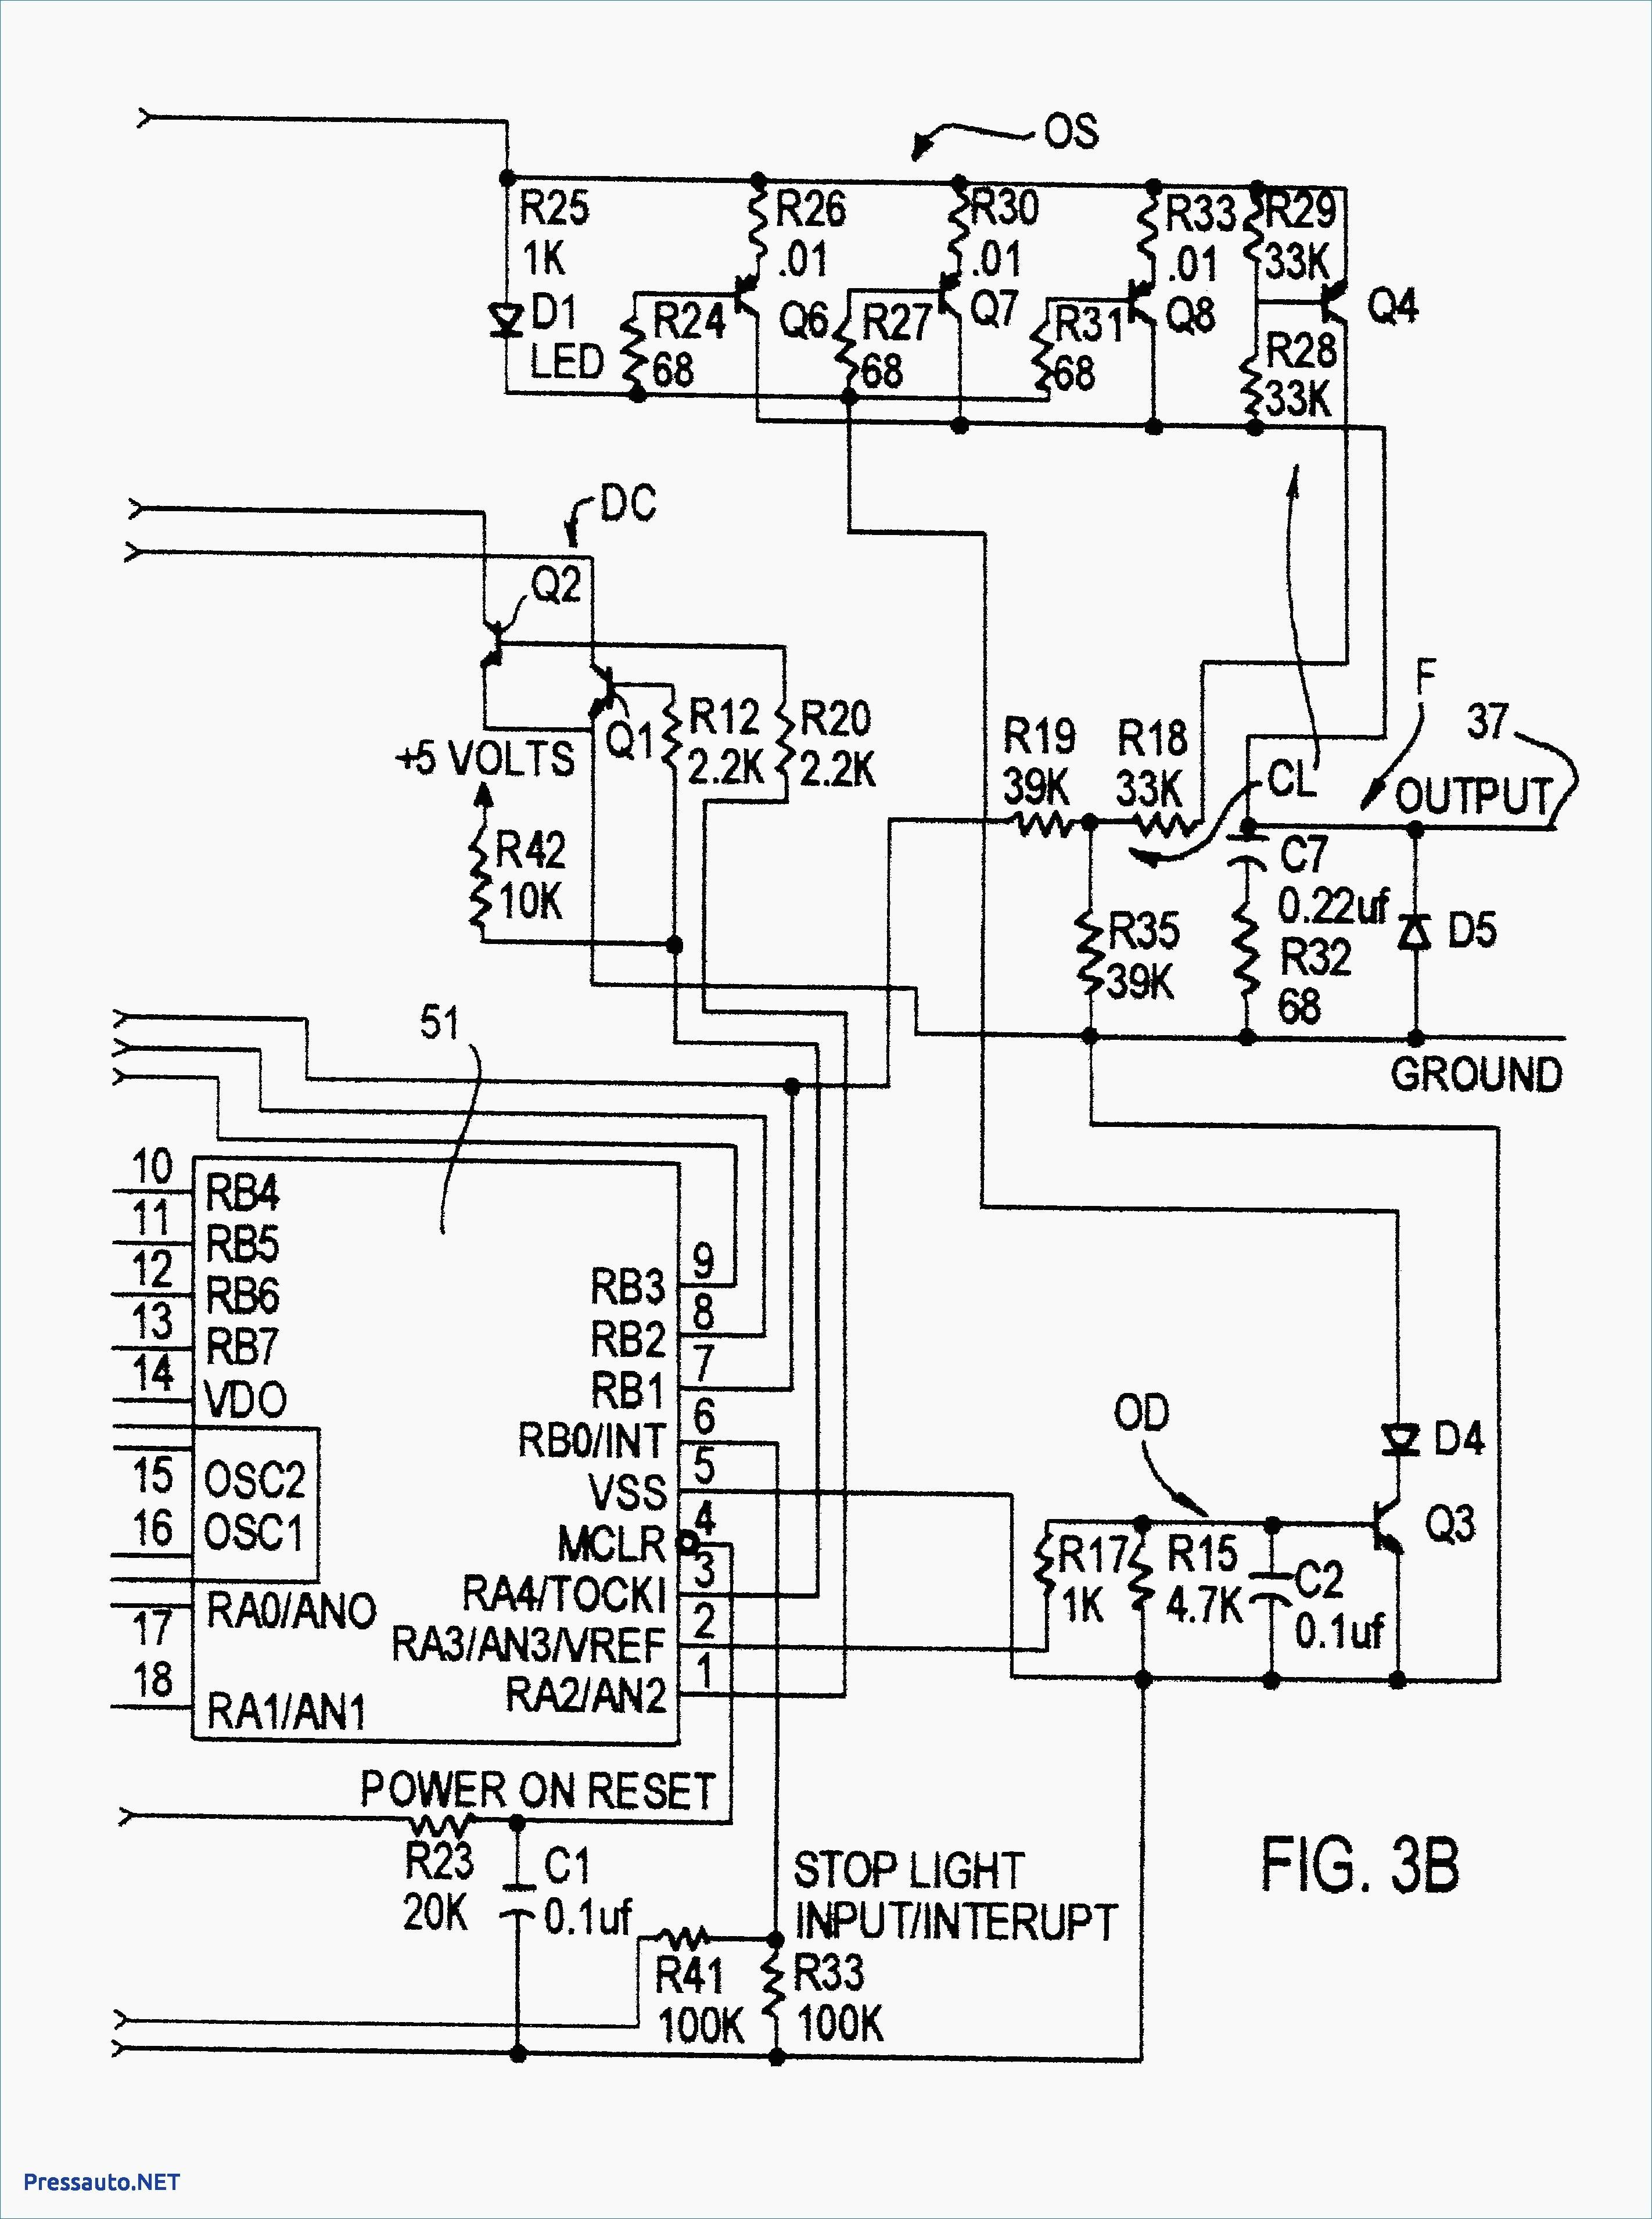 Thermostat Wiring Diagram Load Auto Diagrams